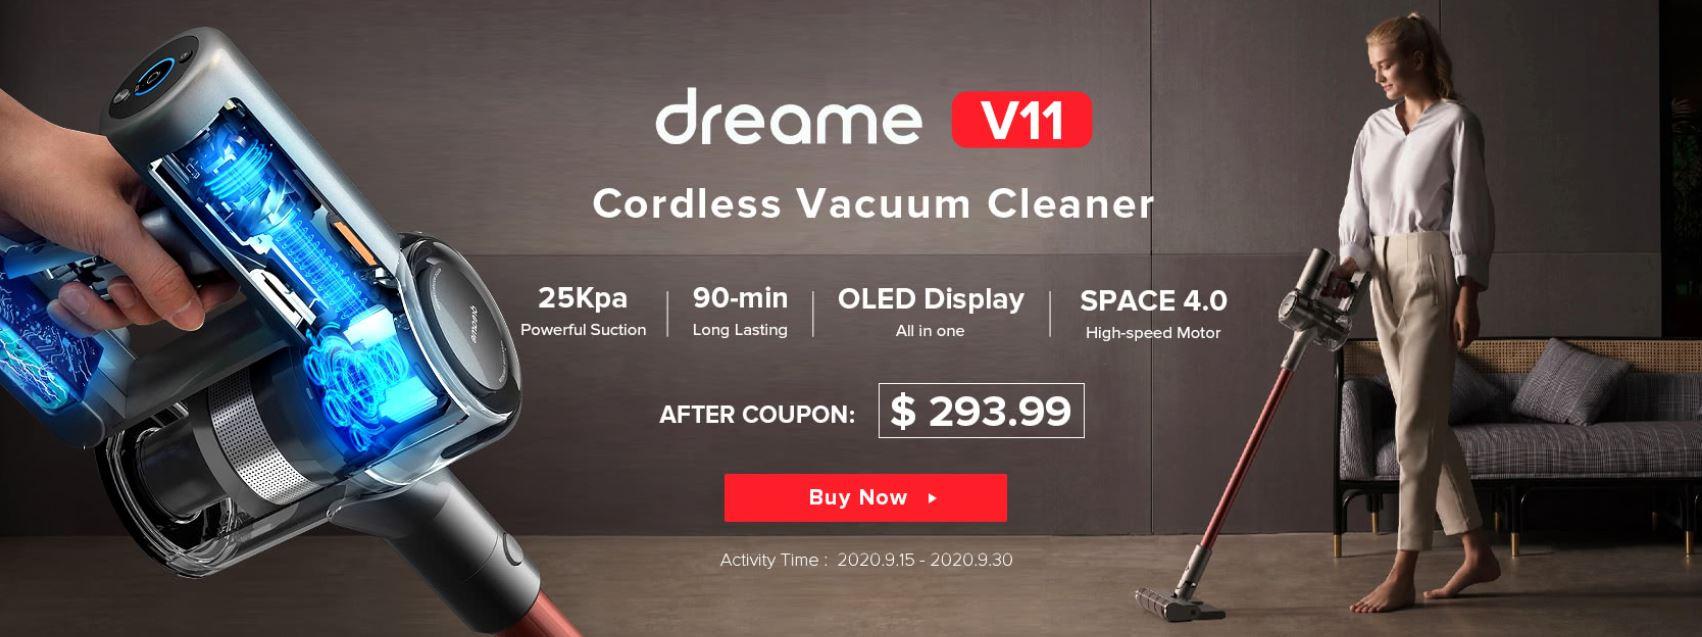 Promocja Dreame V11 na geekbuying.com - kod rabatowy